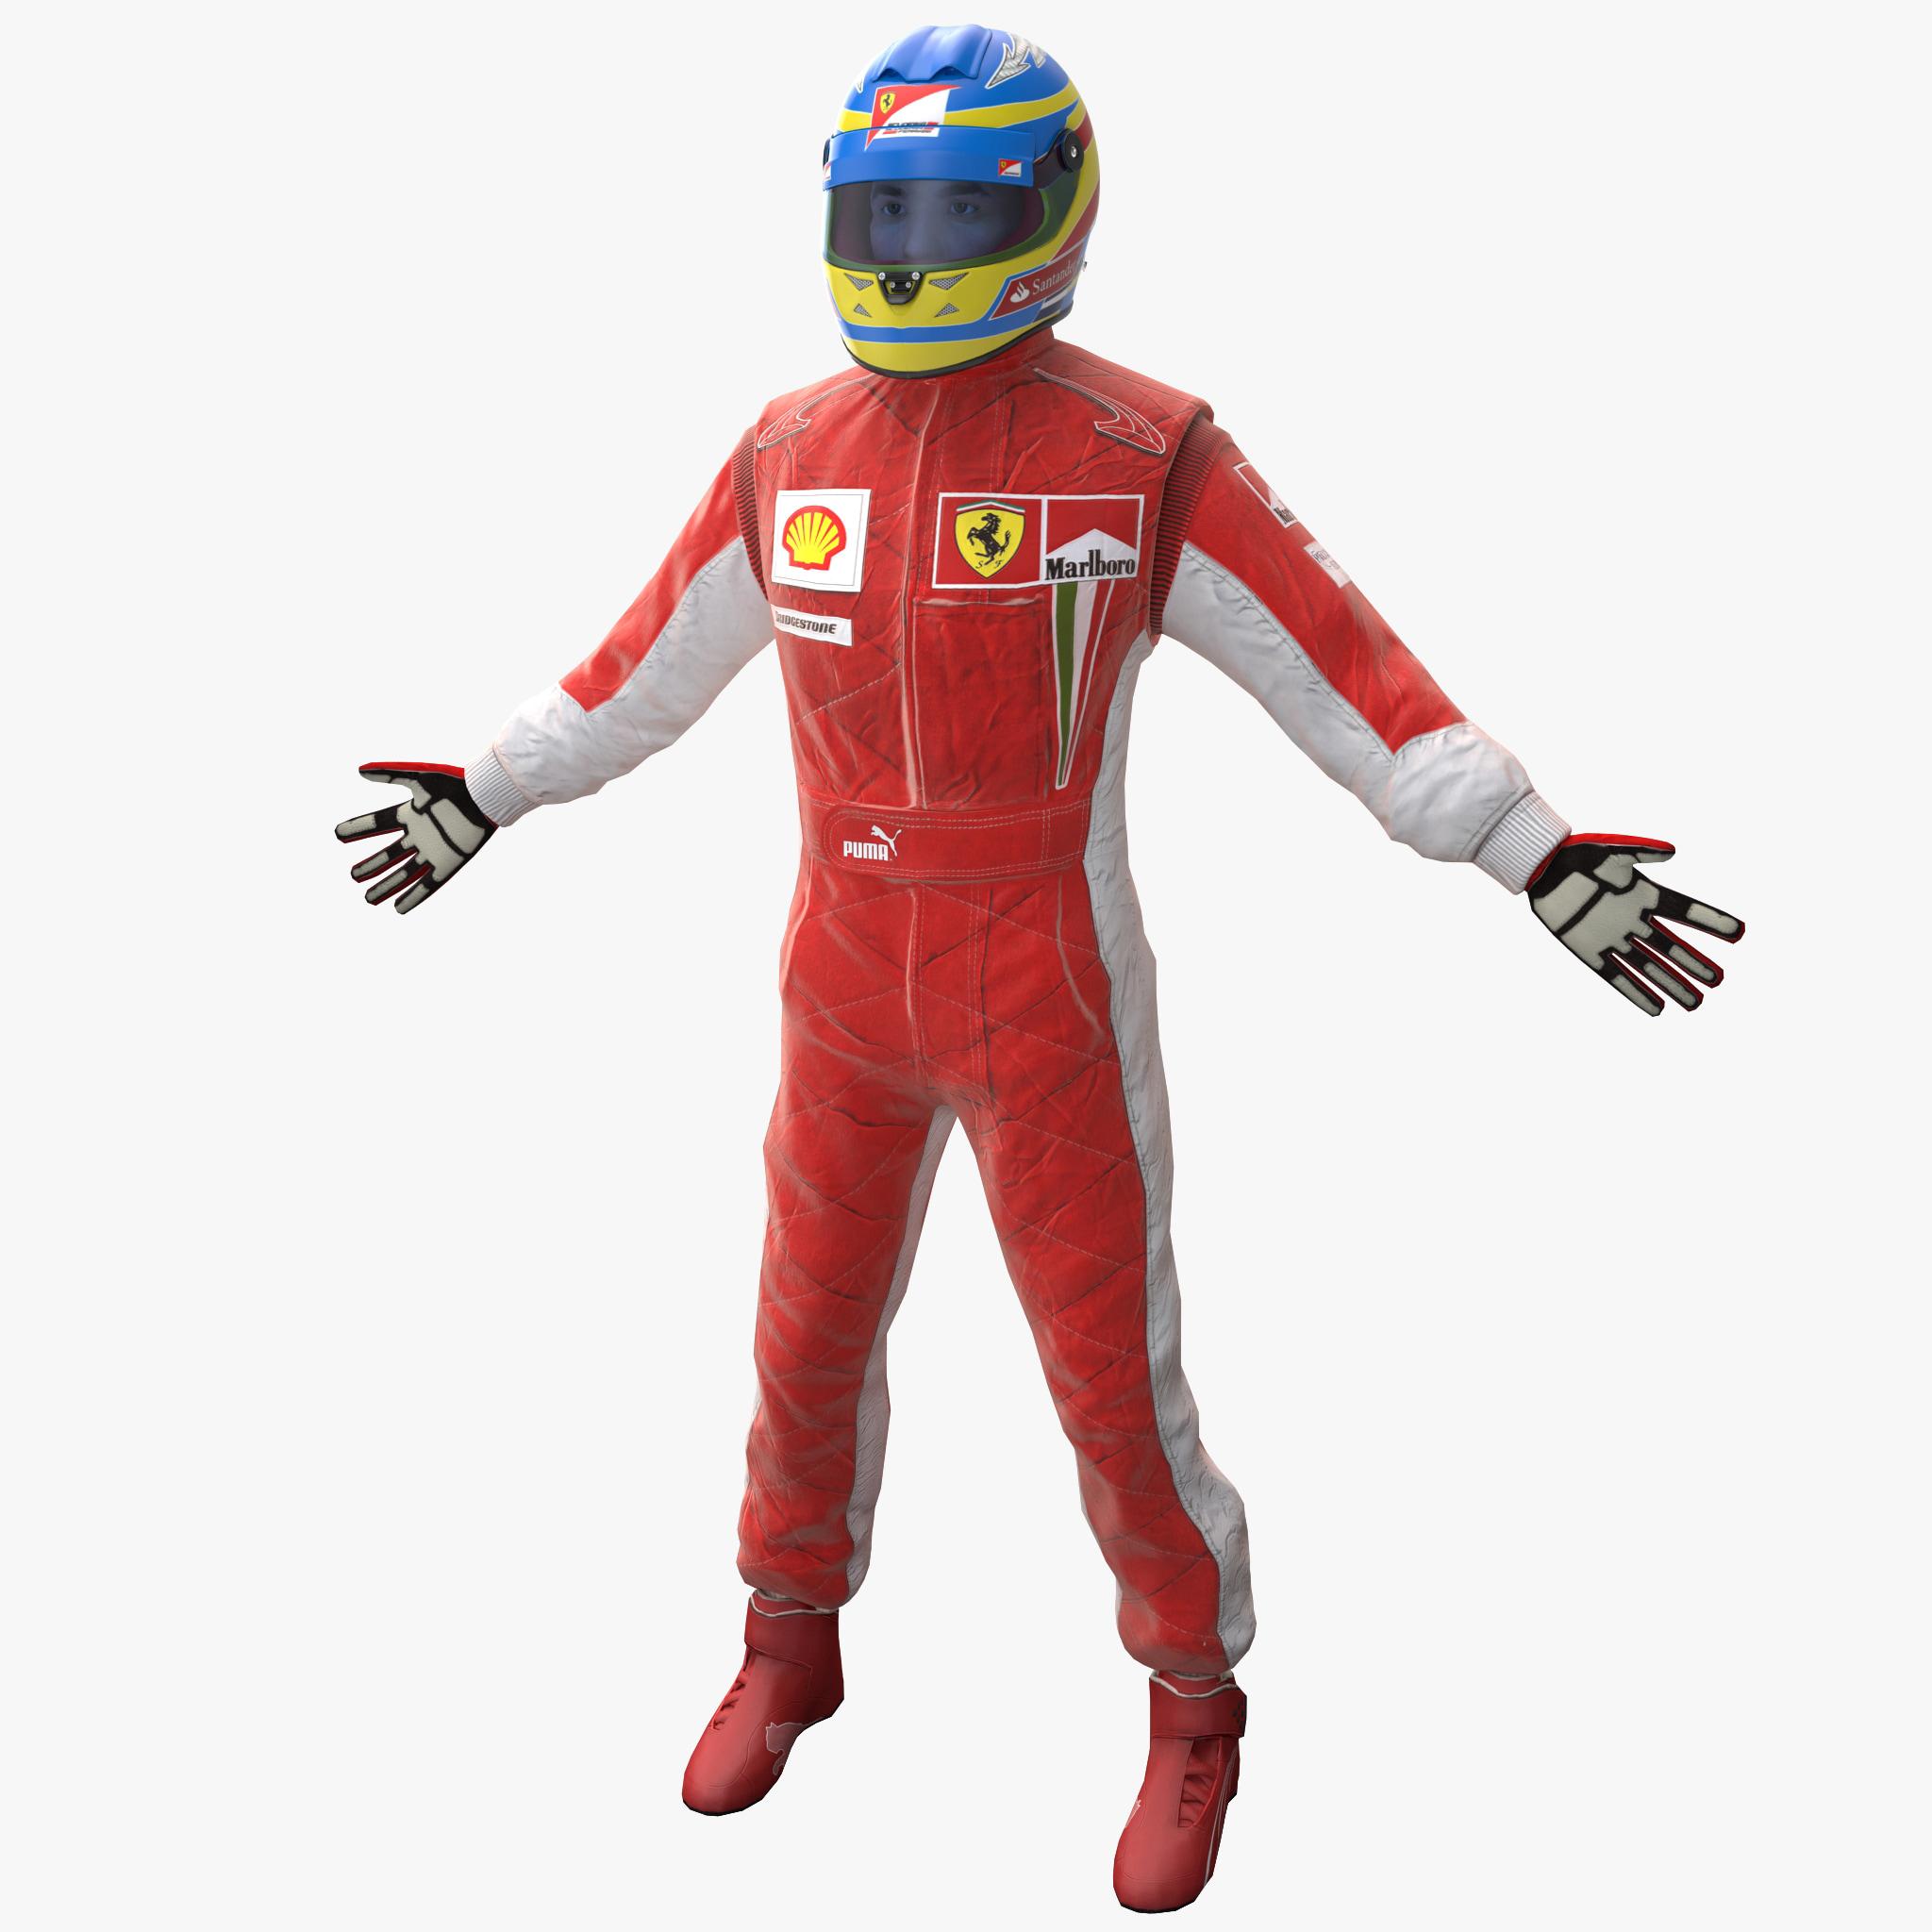 max racing driver ferrari rigged